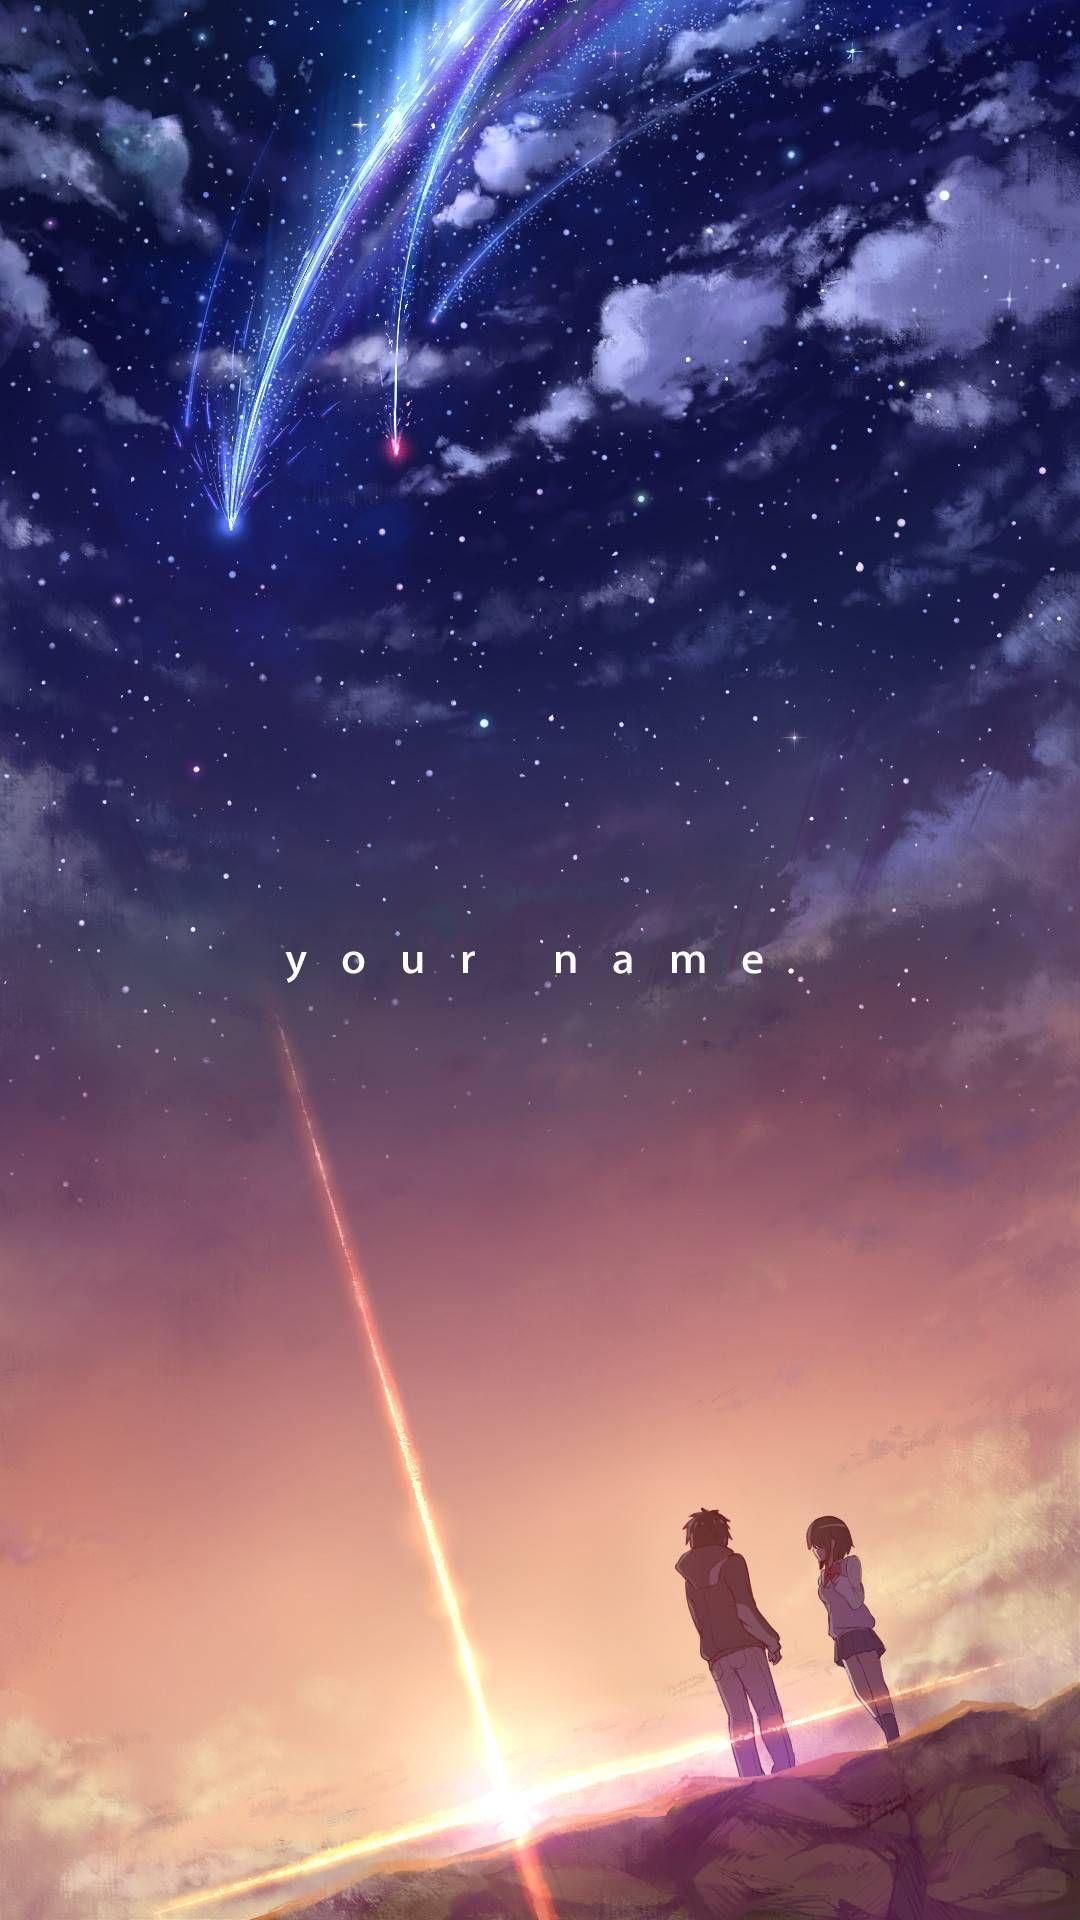 Anime Your Name Live Wallpapers Top Free Anime Your Name Live Backgrounds Wallpaperaccess